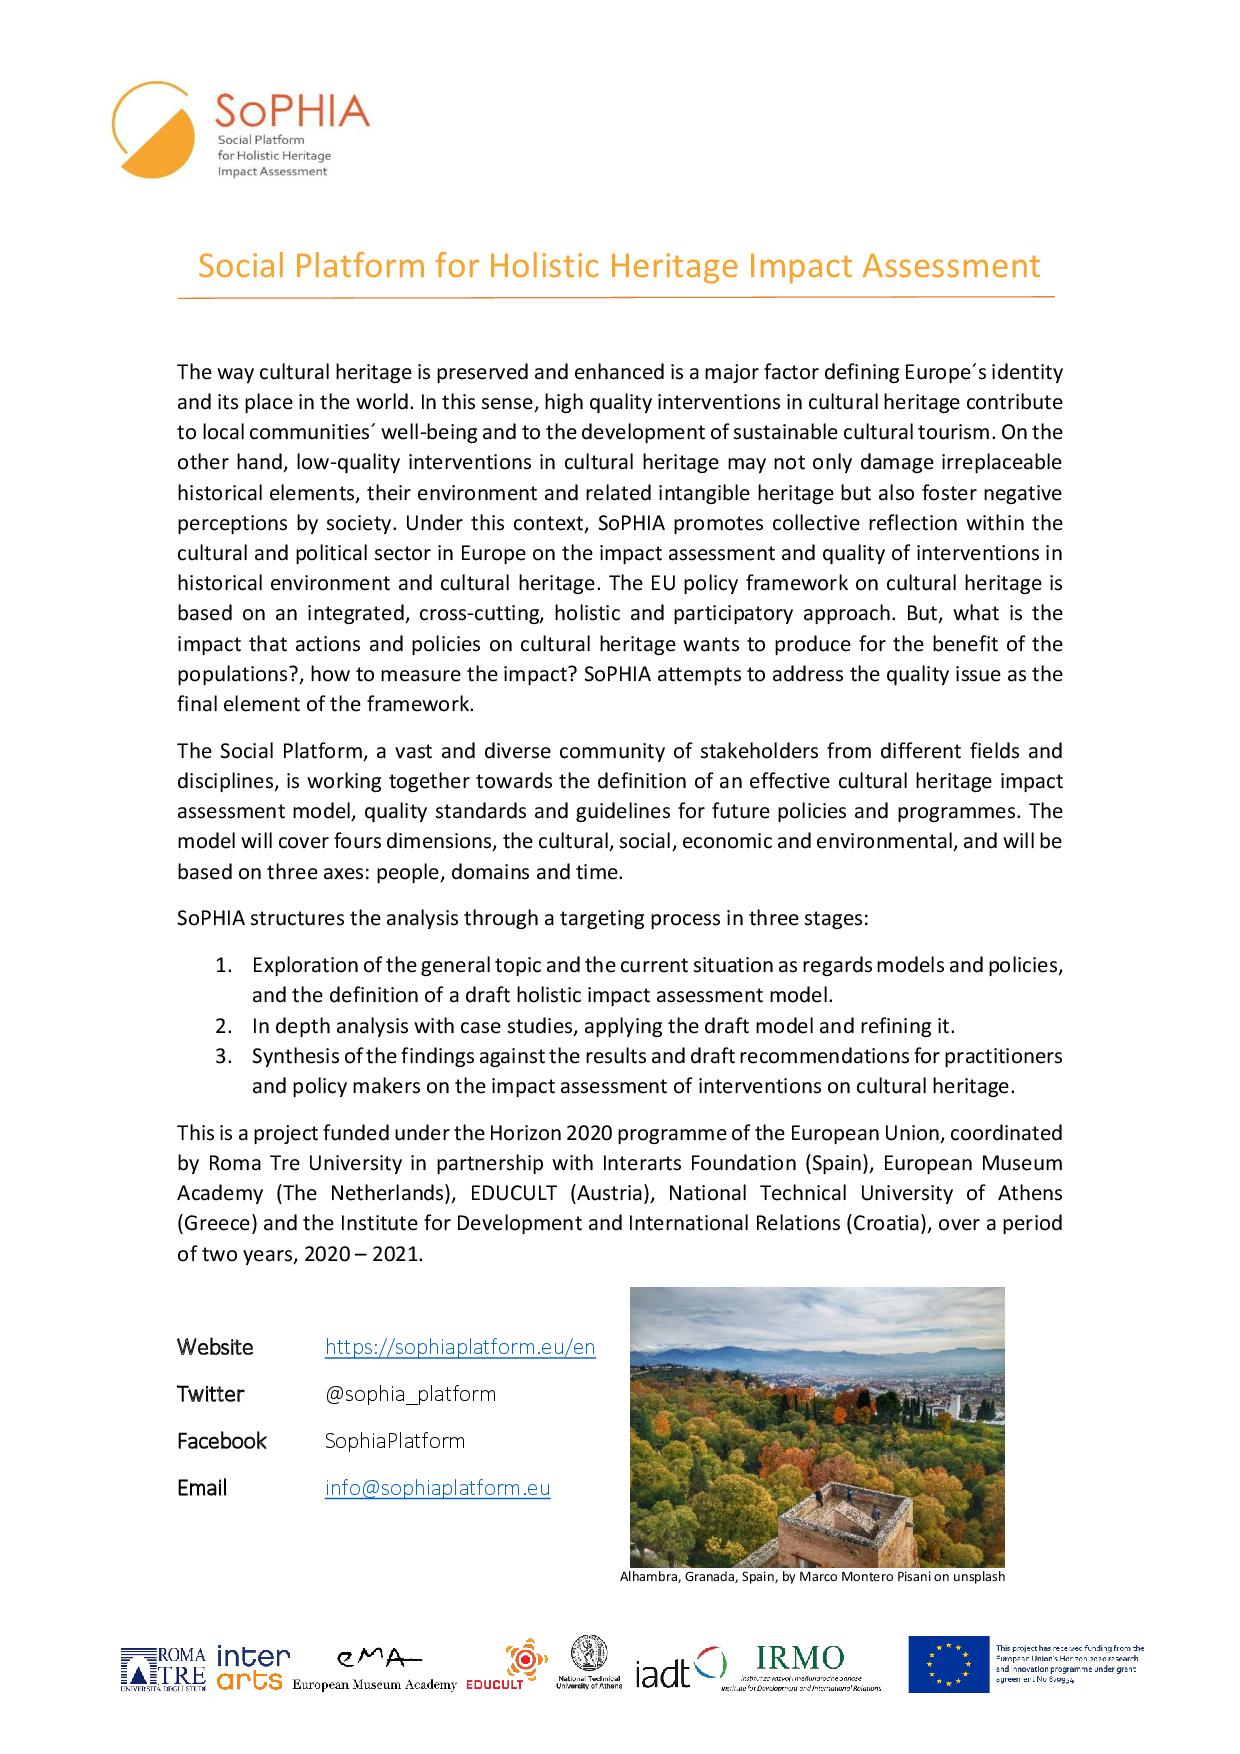 SoPHIA - Social Platform for Holistic Impact Heritage Assessment